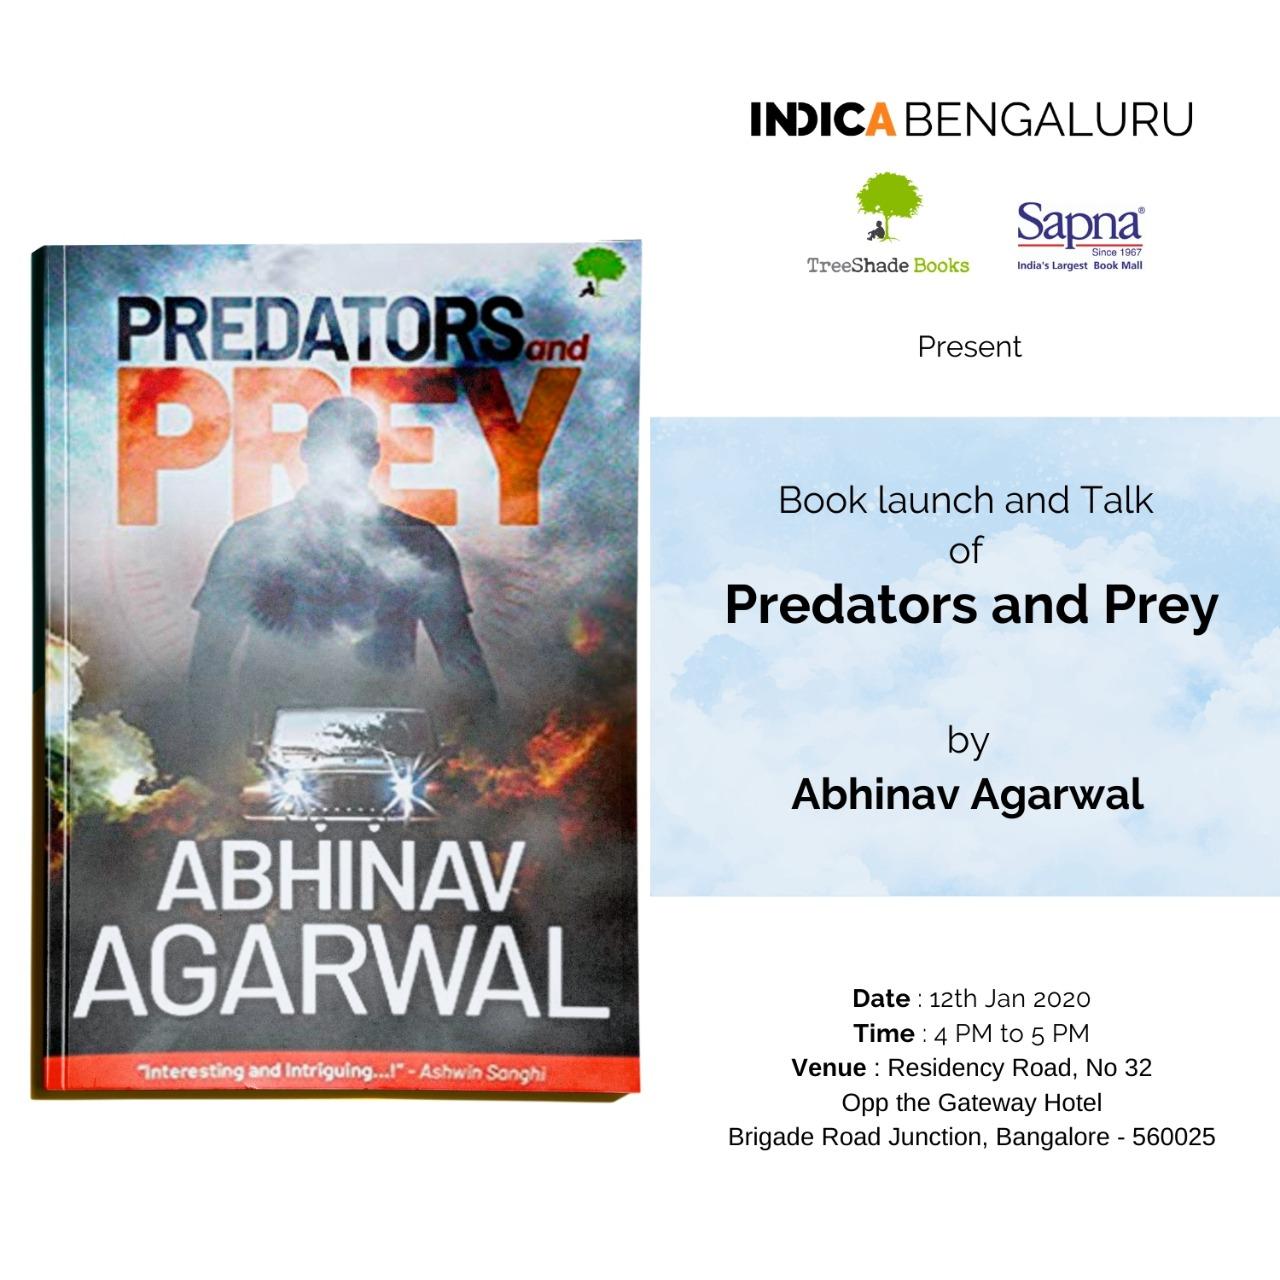 Indica Bengaluru Abhinav Agarwal